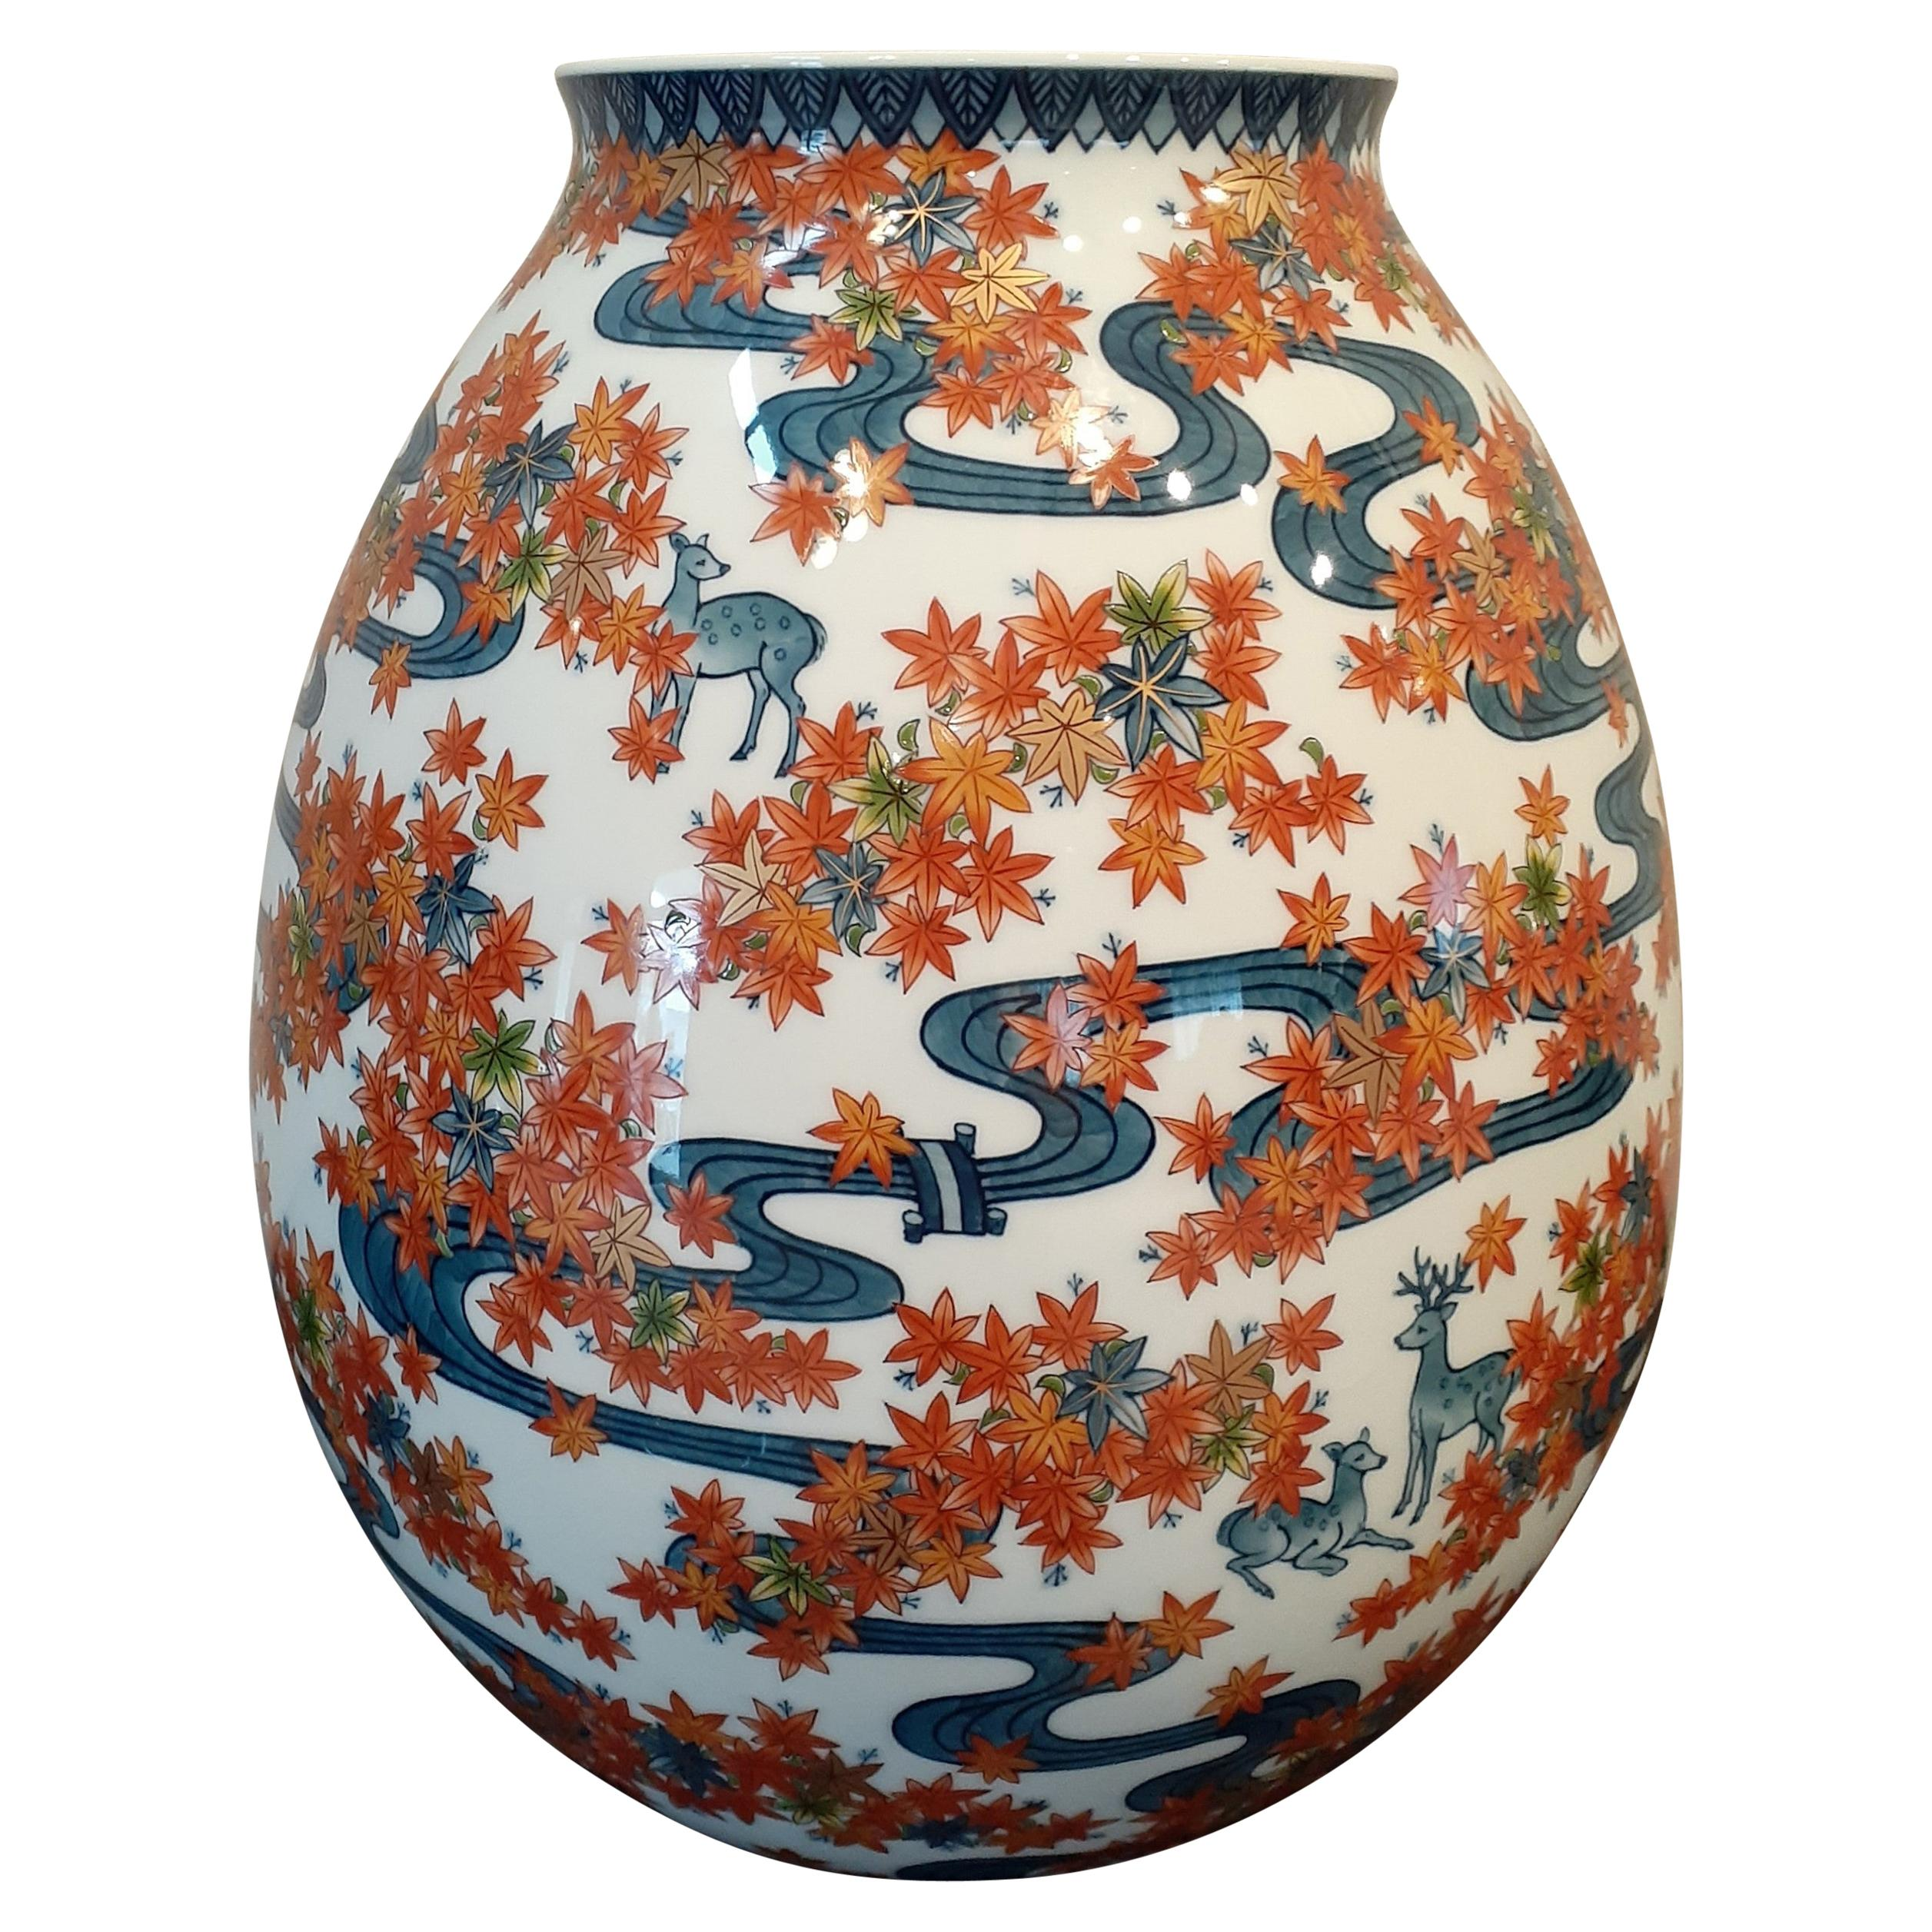 Japanese Contemporary Blue Green Orange Gold Porcelain Vase by Master Artist